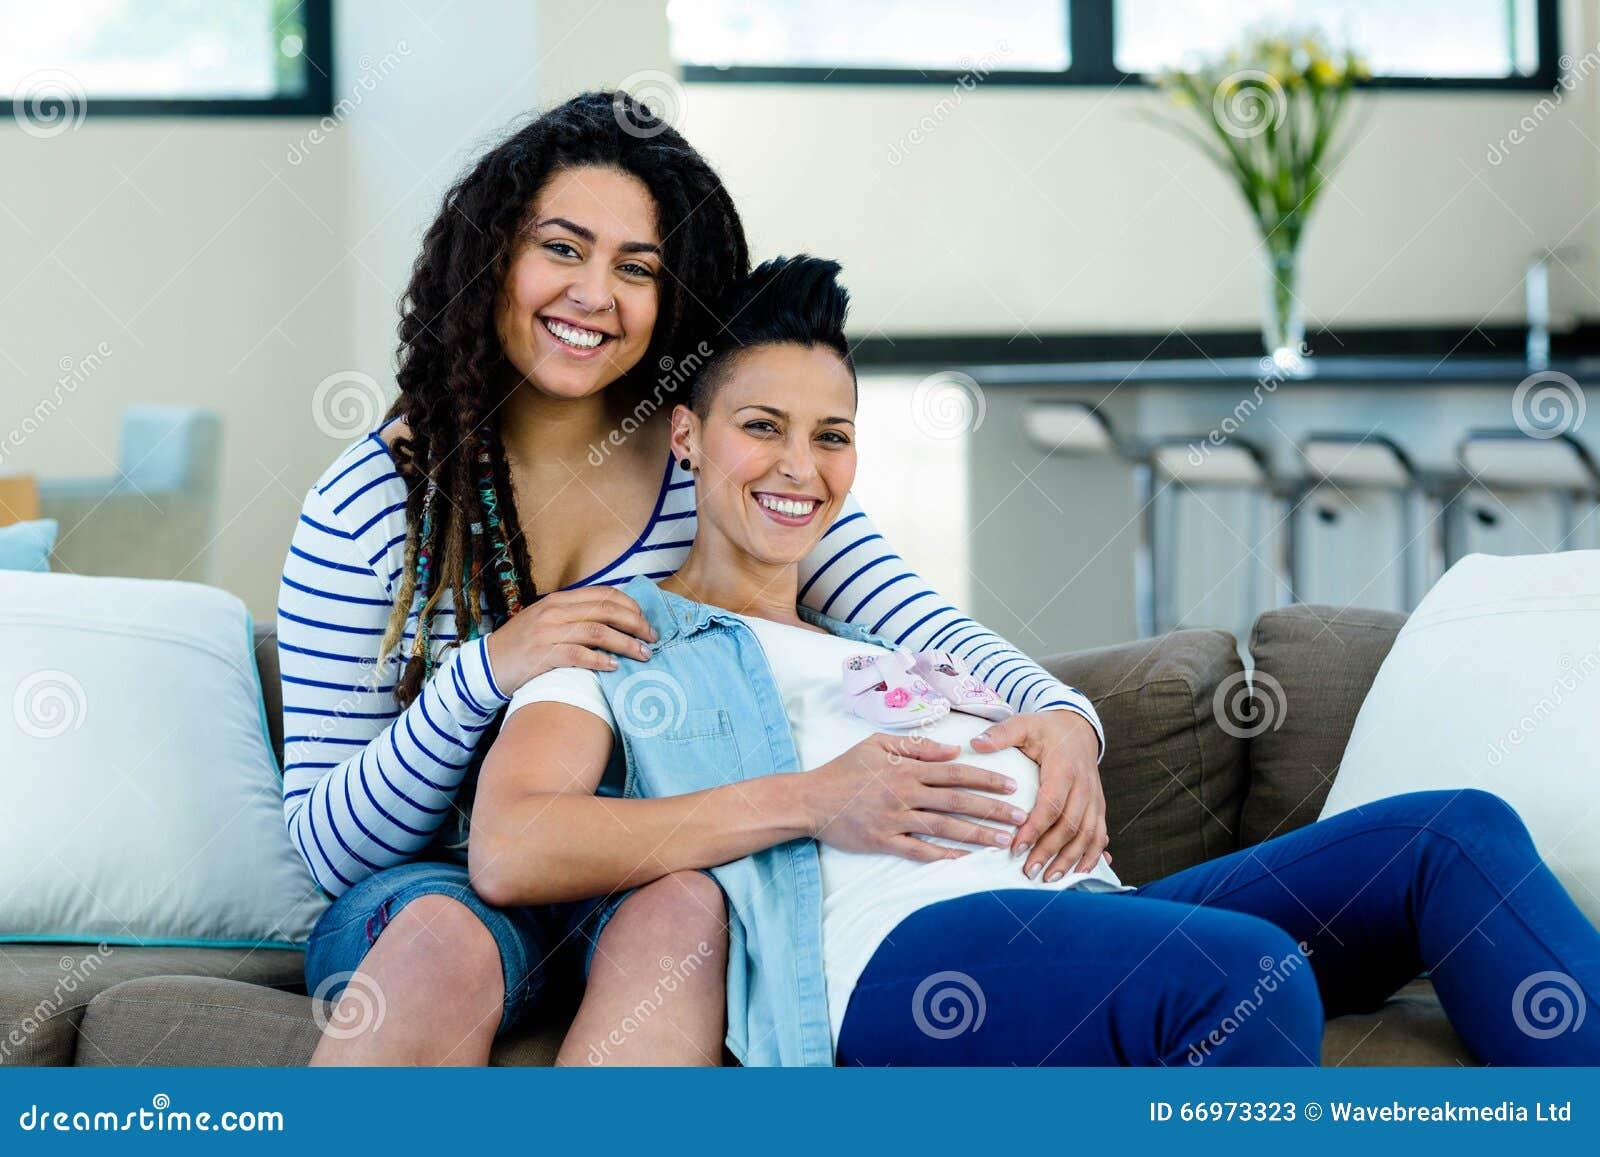 Lesbian Couple Pregnant